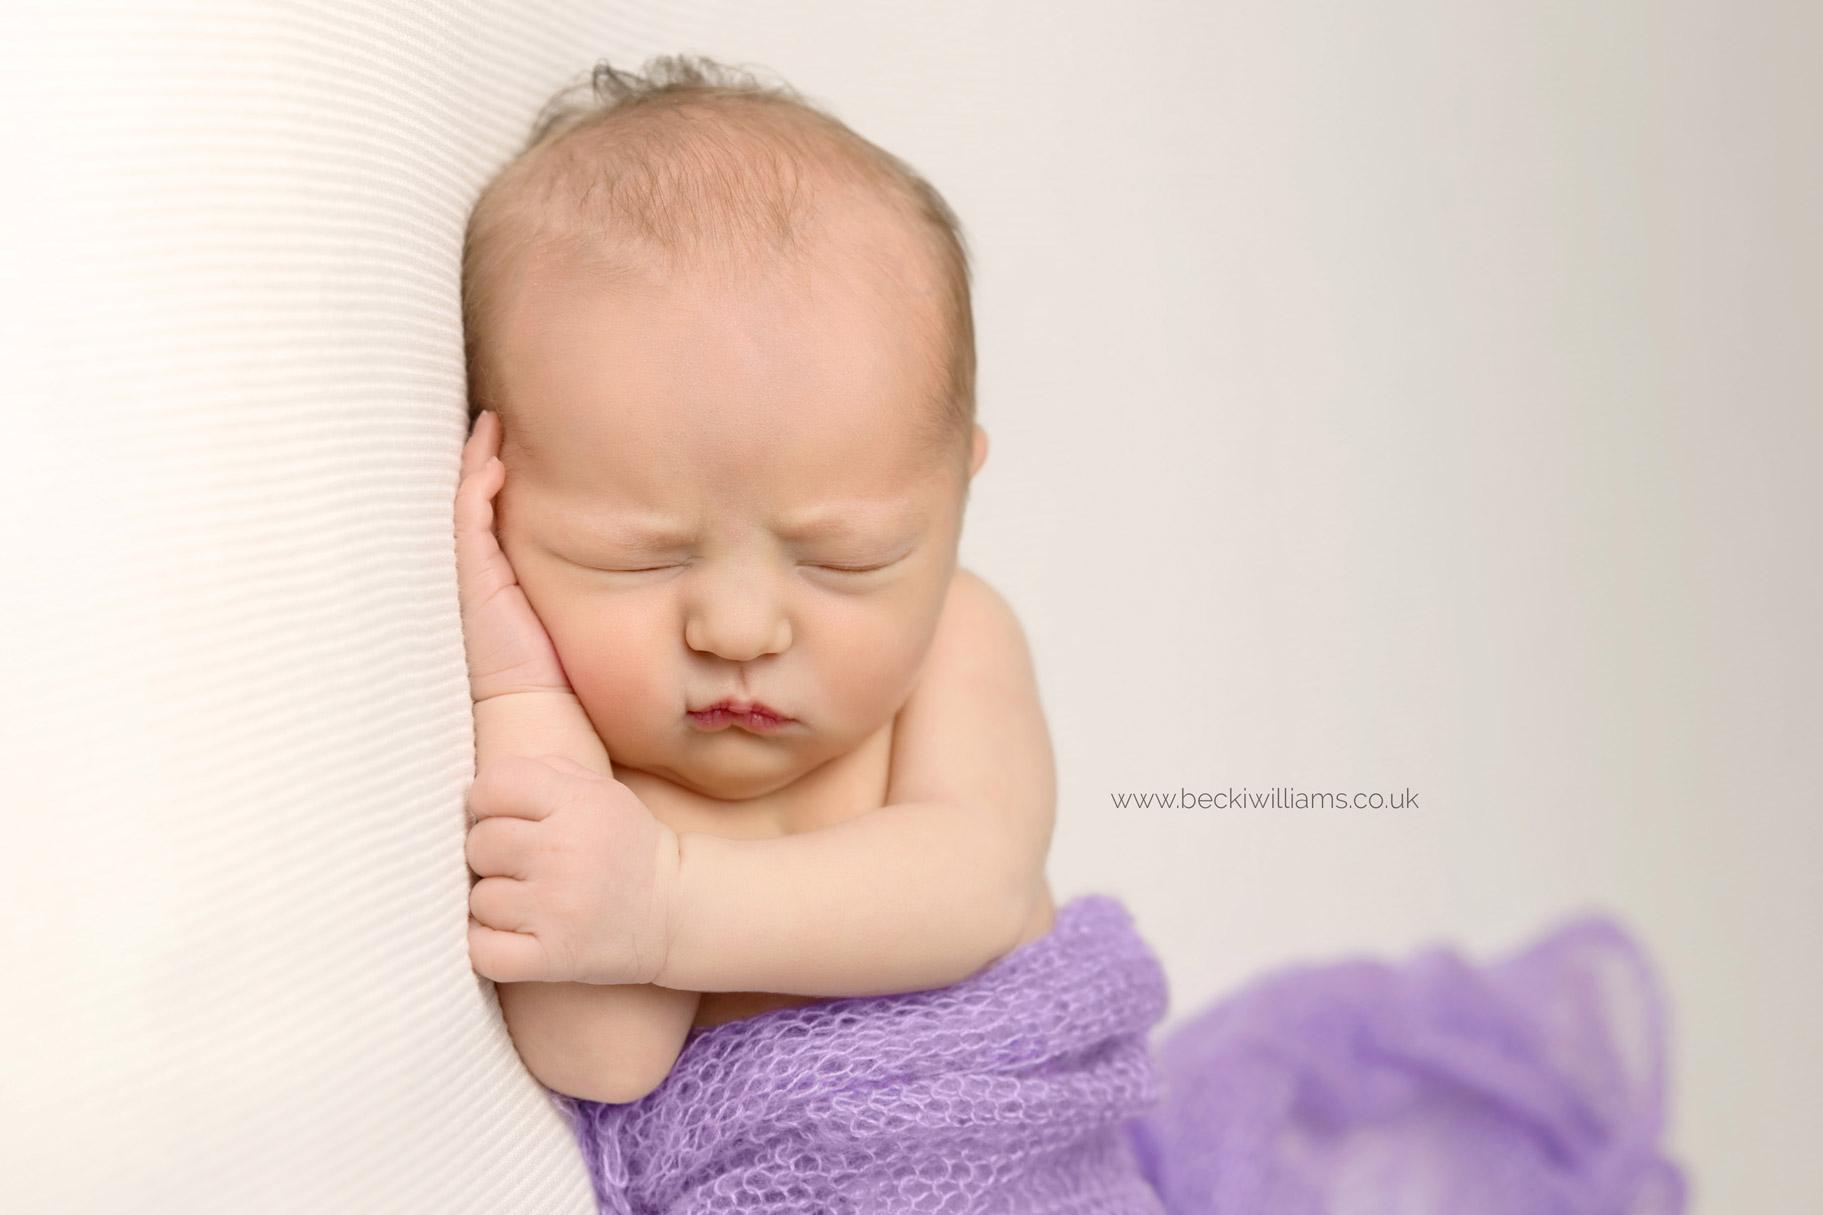 sleeping newborn baby covered in a purple blanket at her professional newborn photo shoot in hemel hempstead